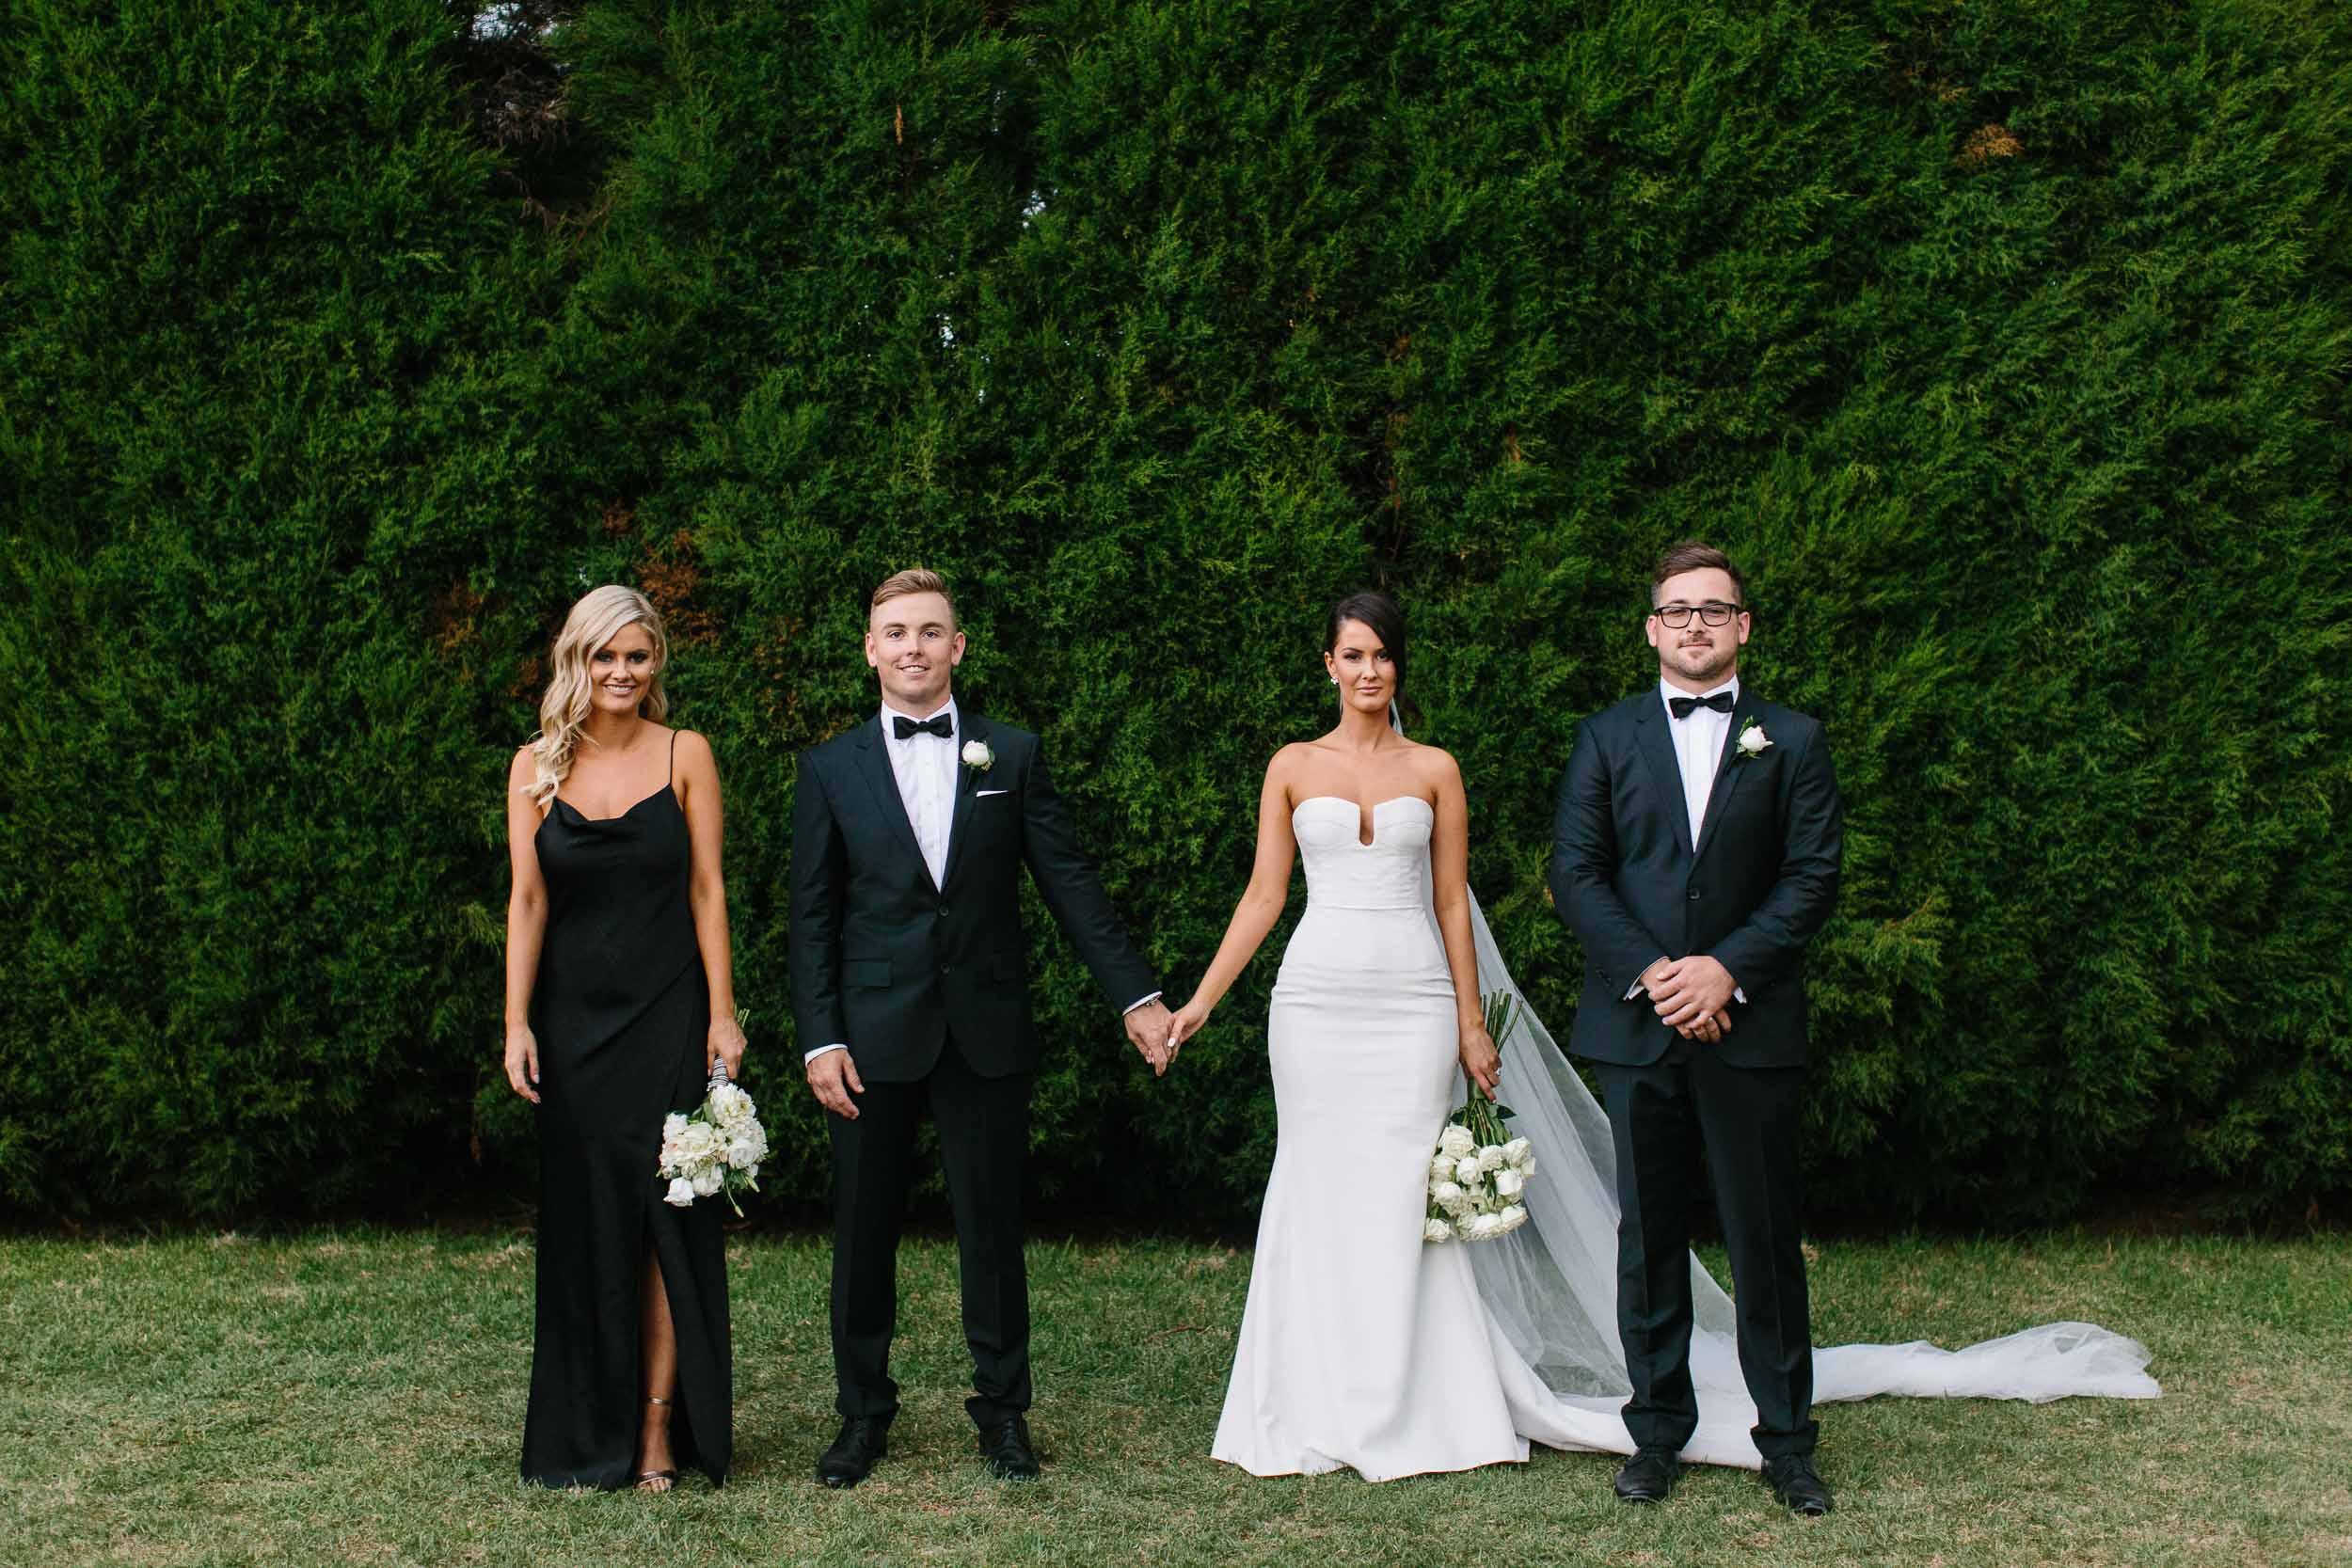 Kas-Richards-Melbourne-Garden-Wedding-Aerial-South-Whark-Georgia-Young-Couture-312.jpg